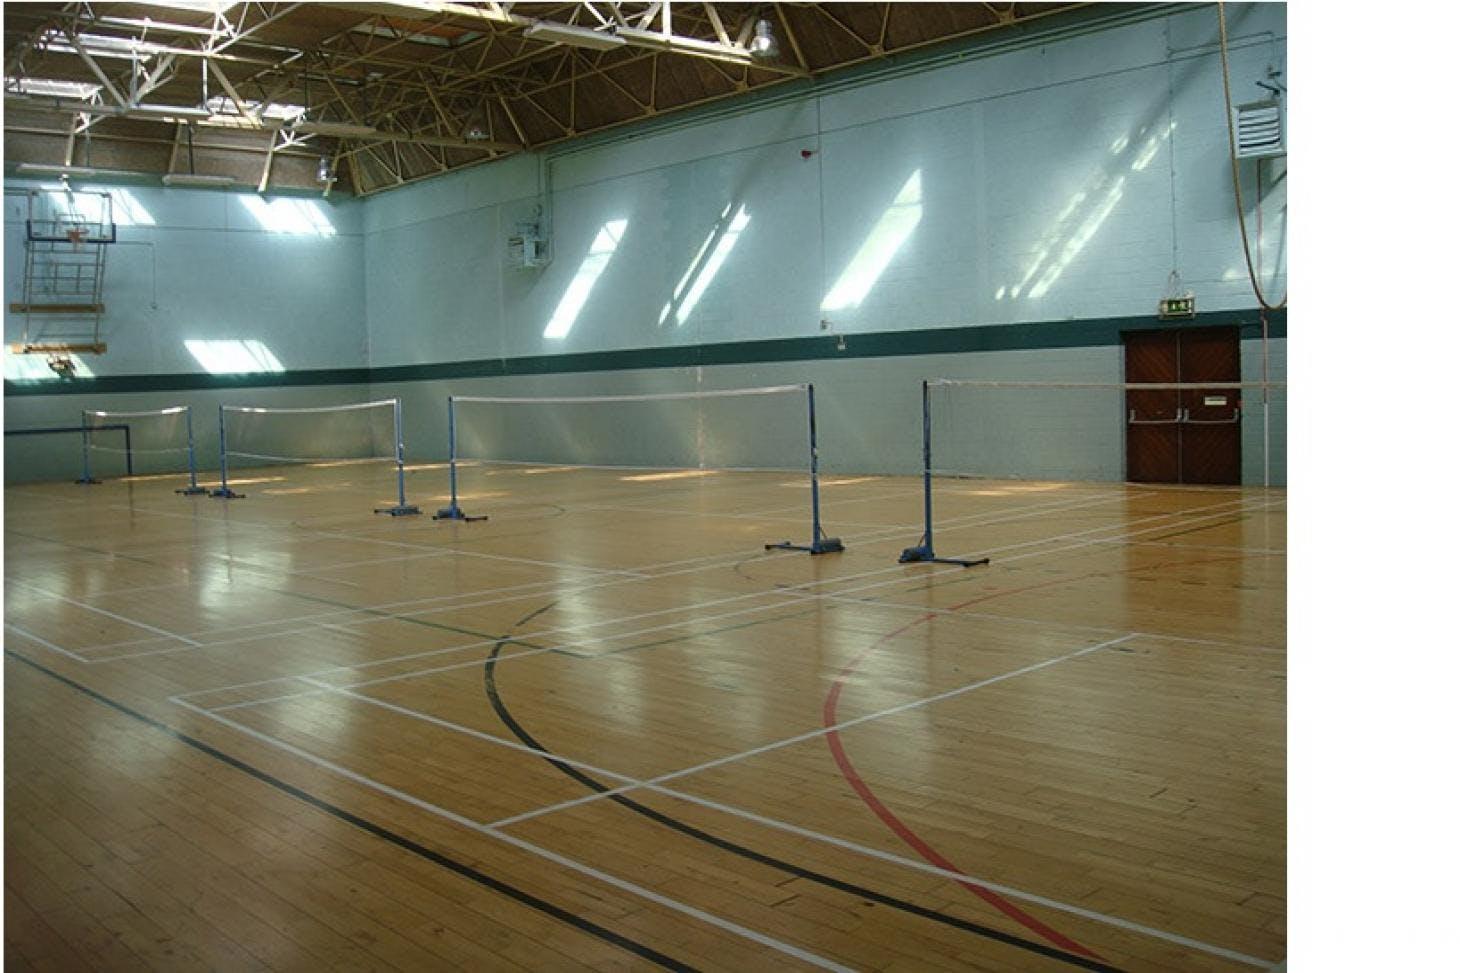 Portmarnock Sports & Leisure Club Indoor | Hard badminton court